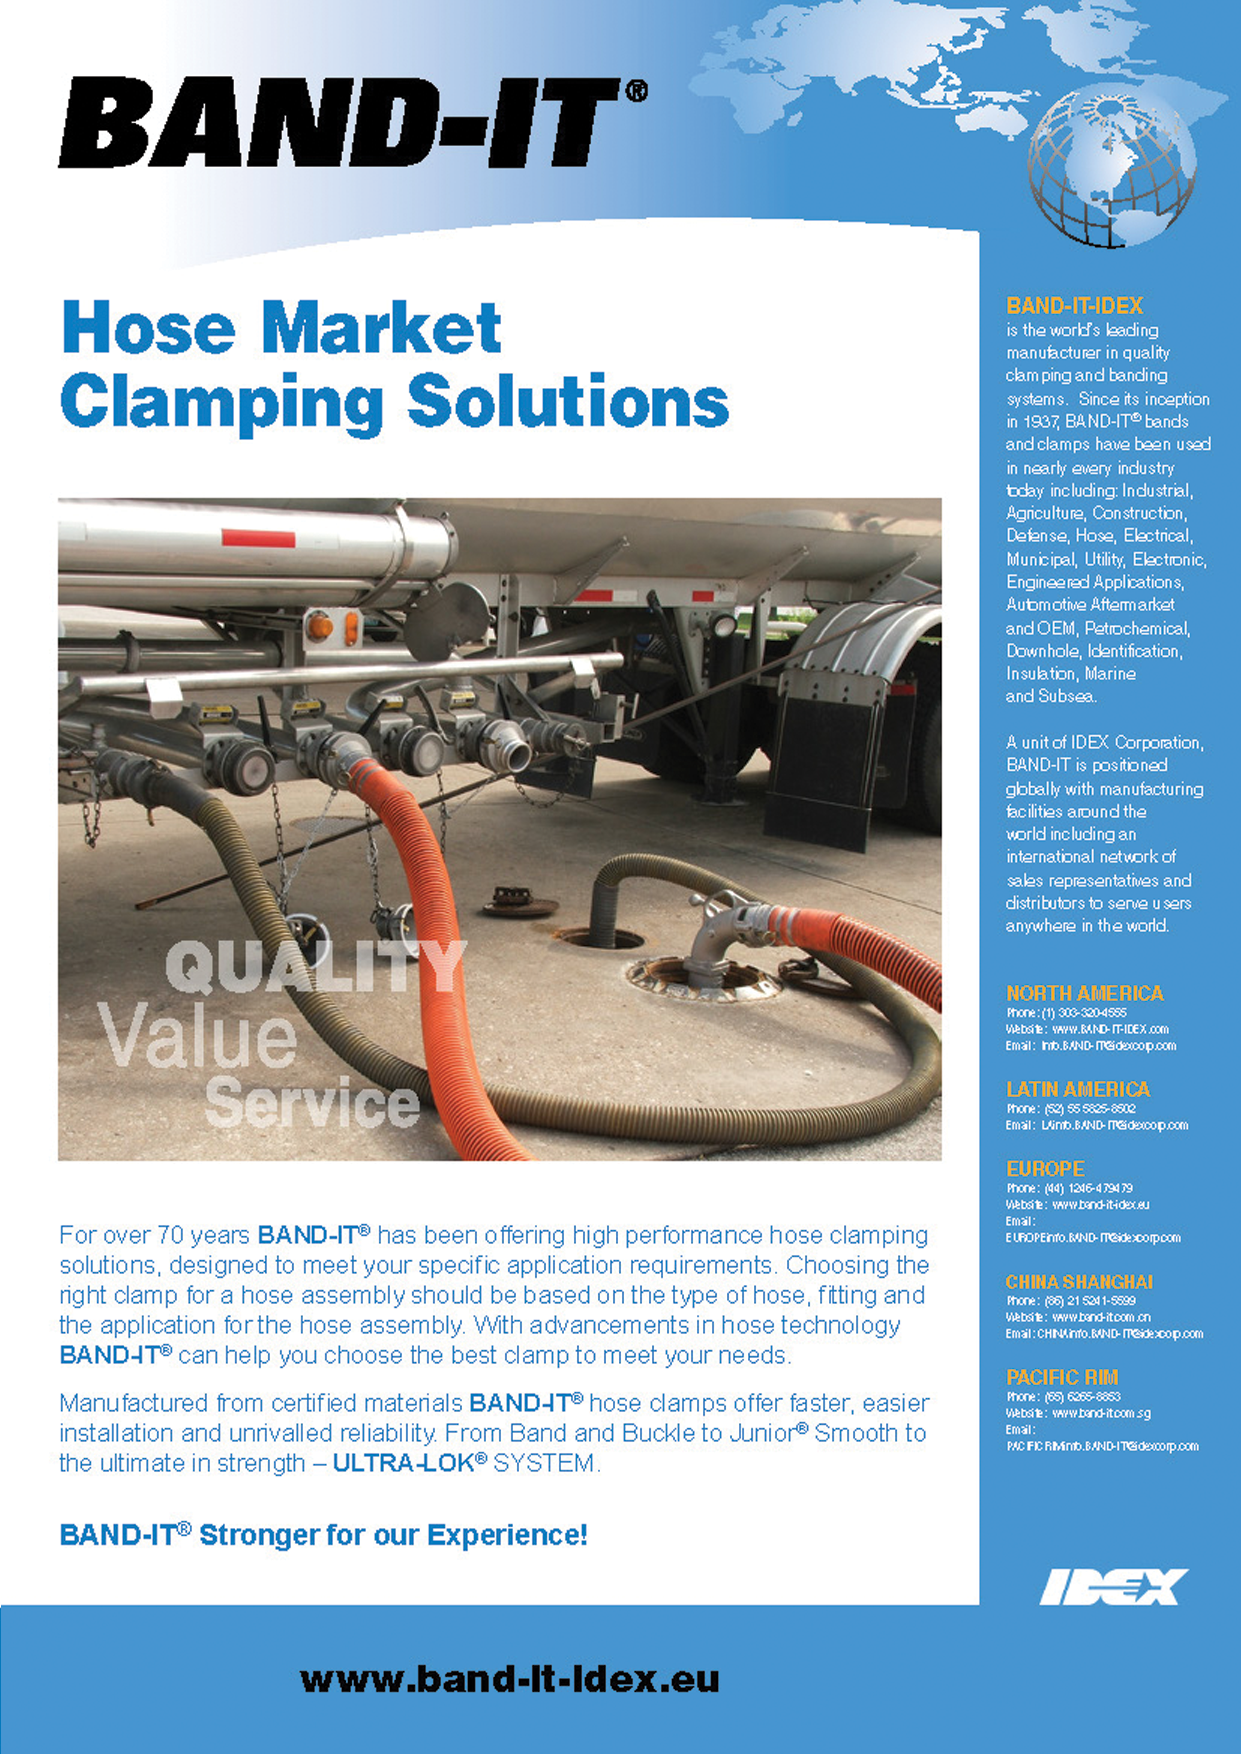 Hose Market Brochure